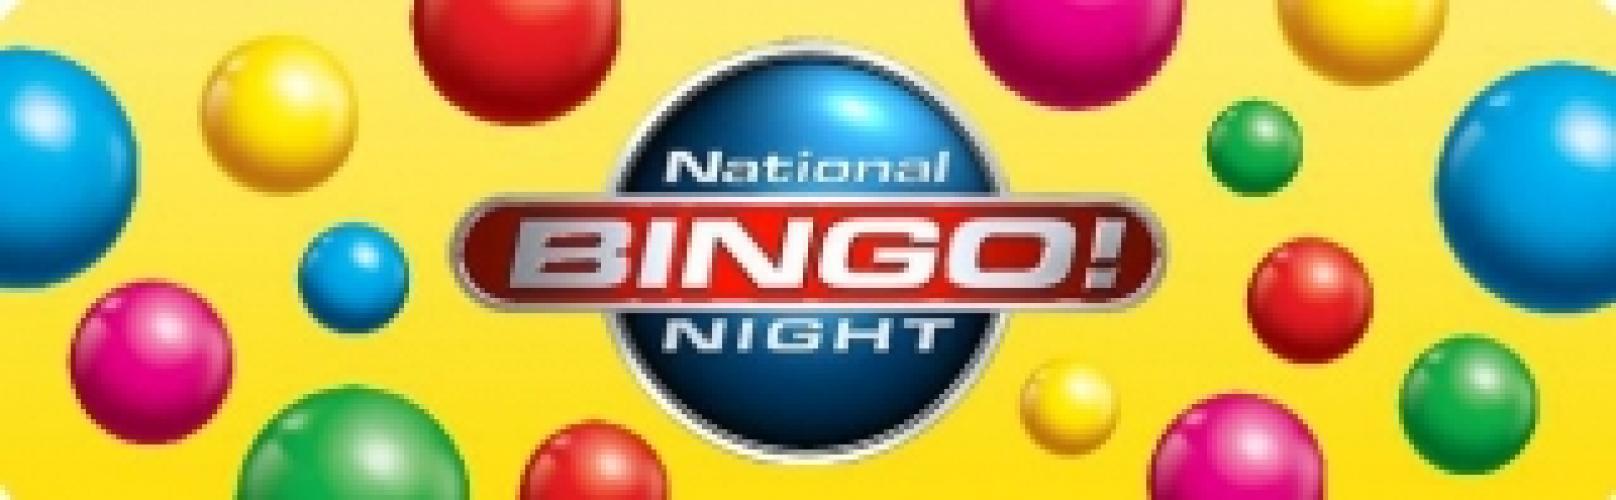 National Bingo Night (AU) next episode air date poster